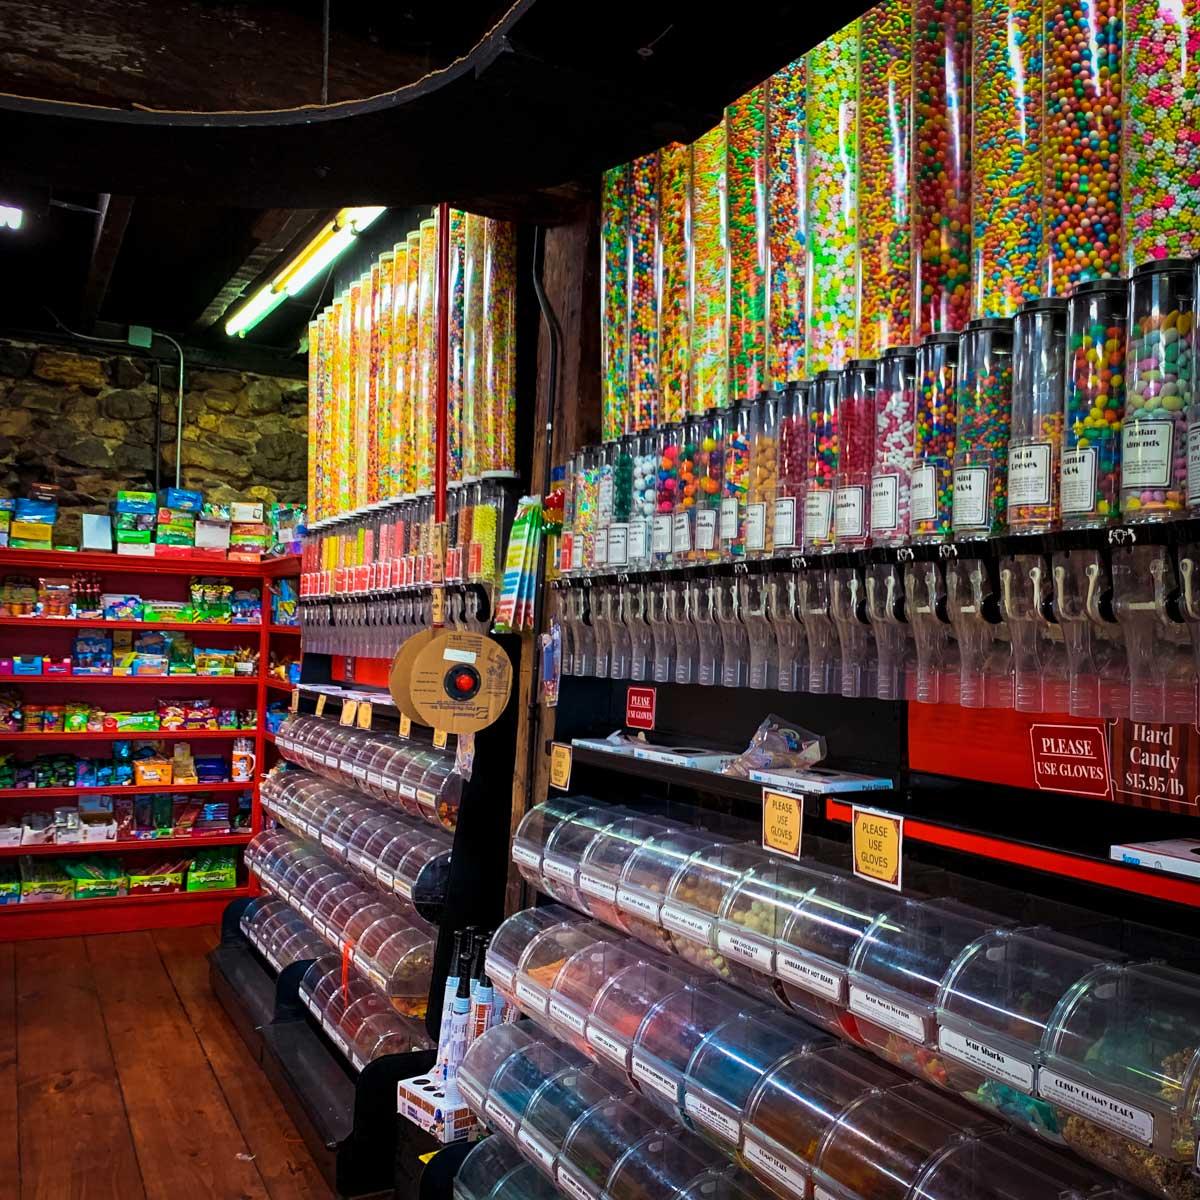 River Street Candy Shoppe